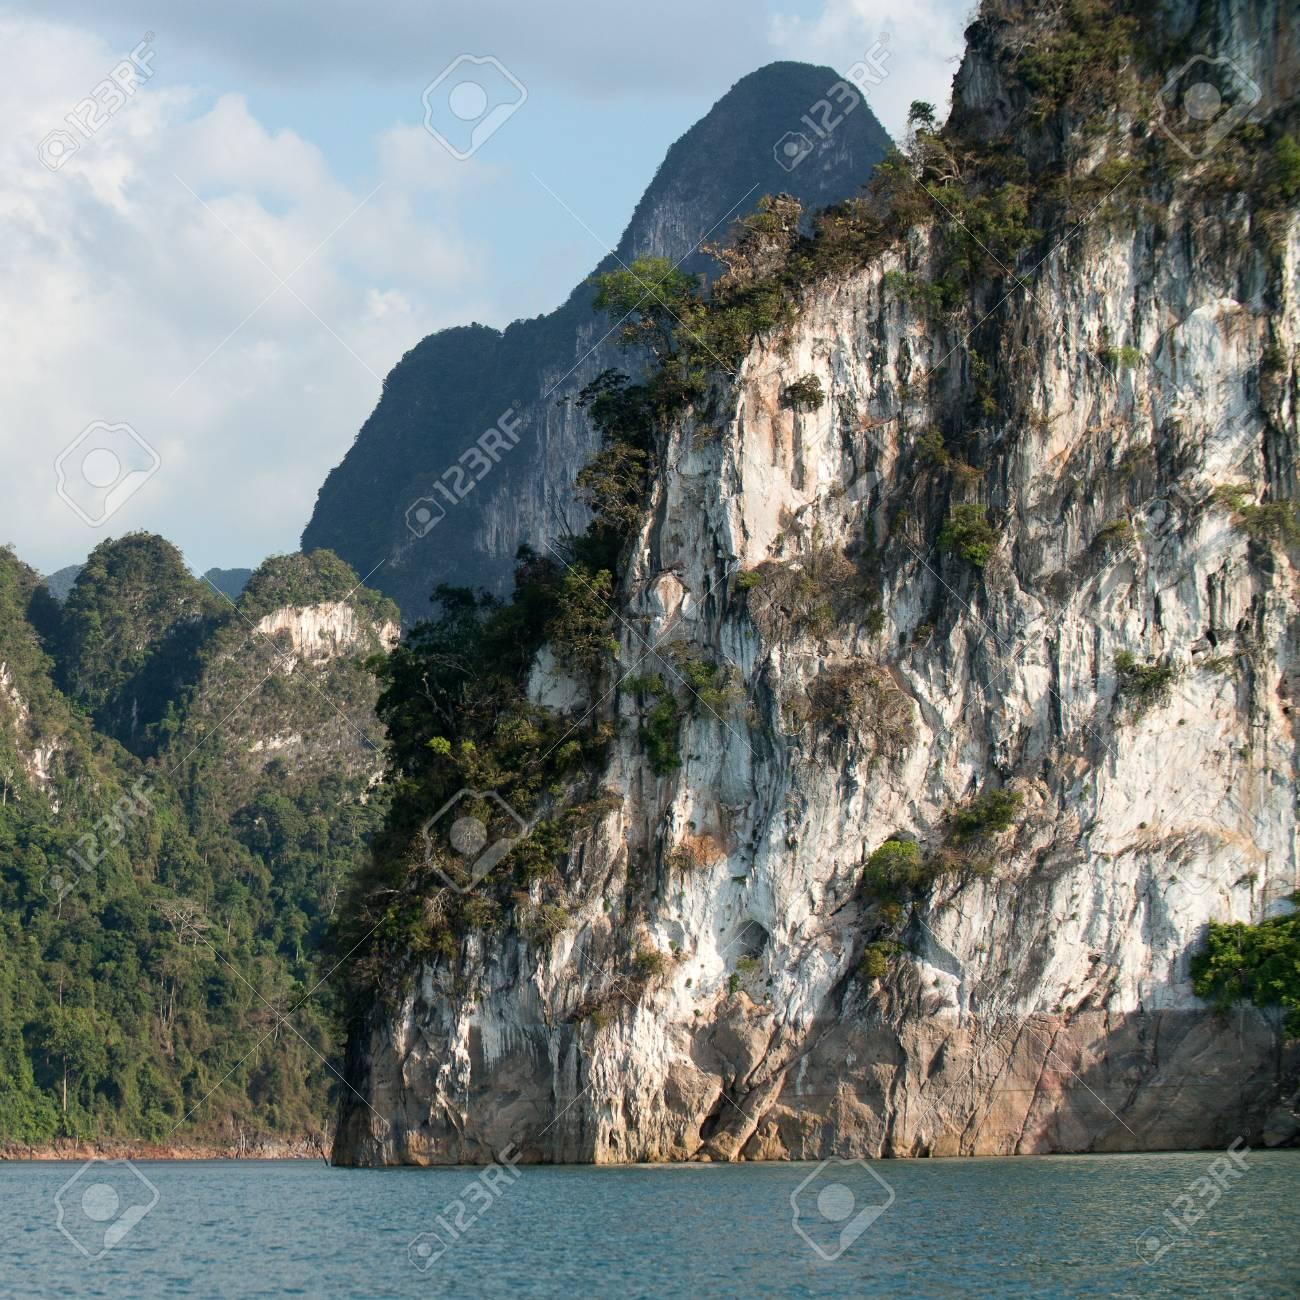 Chiao Lan Lake at Khao Sok National Park, Thailand Stock Photo - 18644163